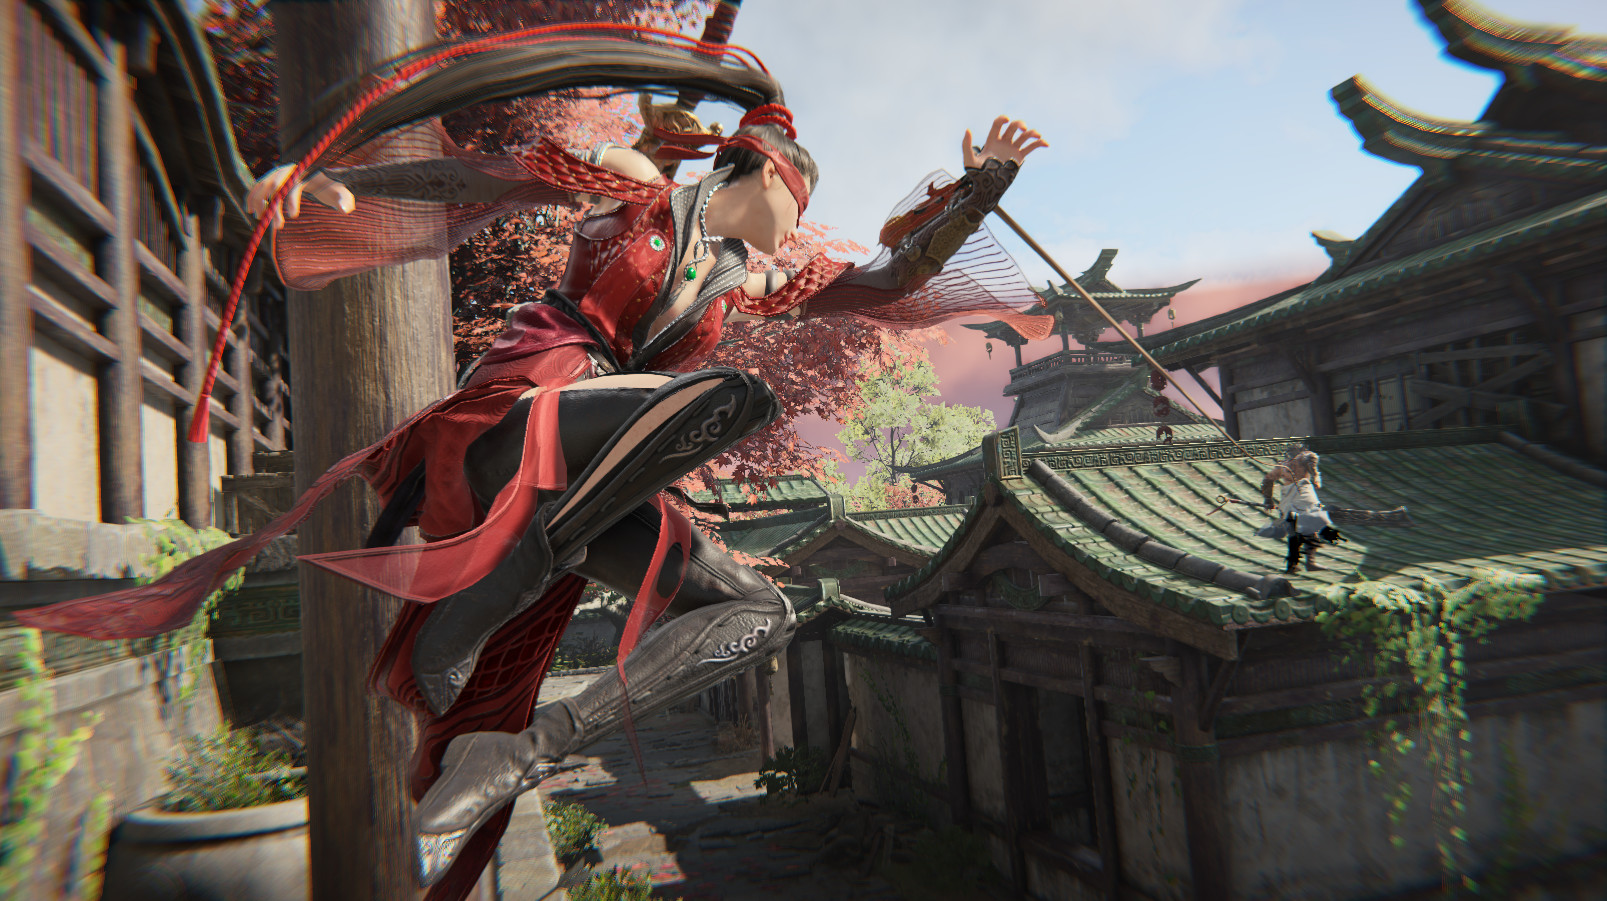 Naraka: Bladepoint release time confirmed